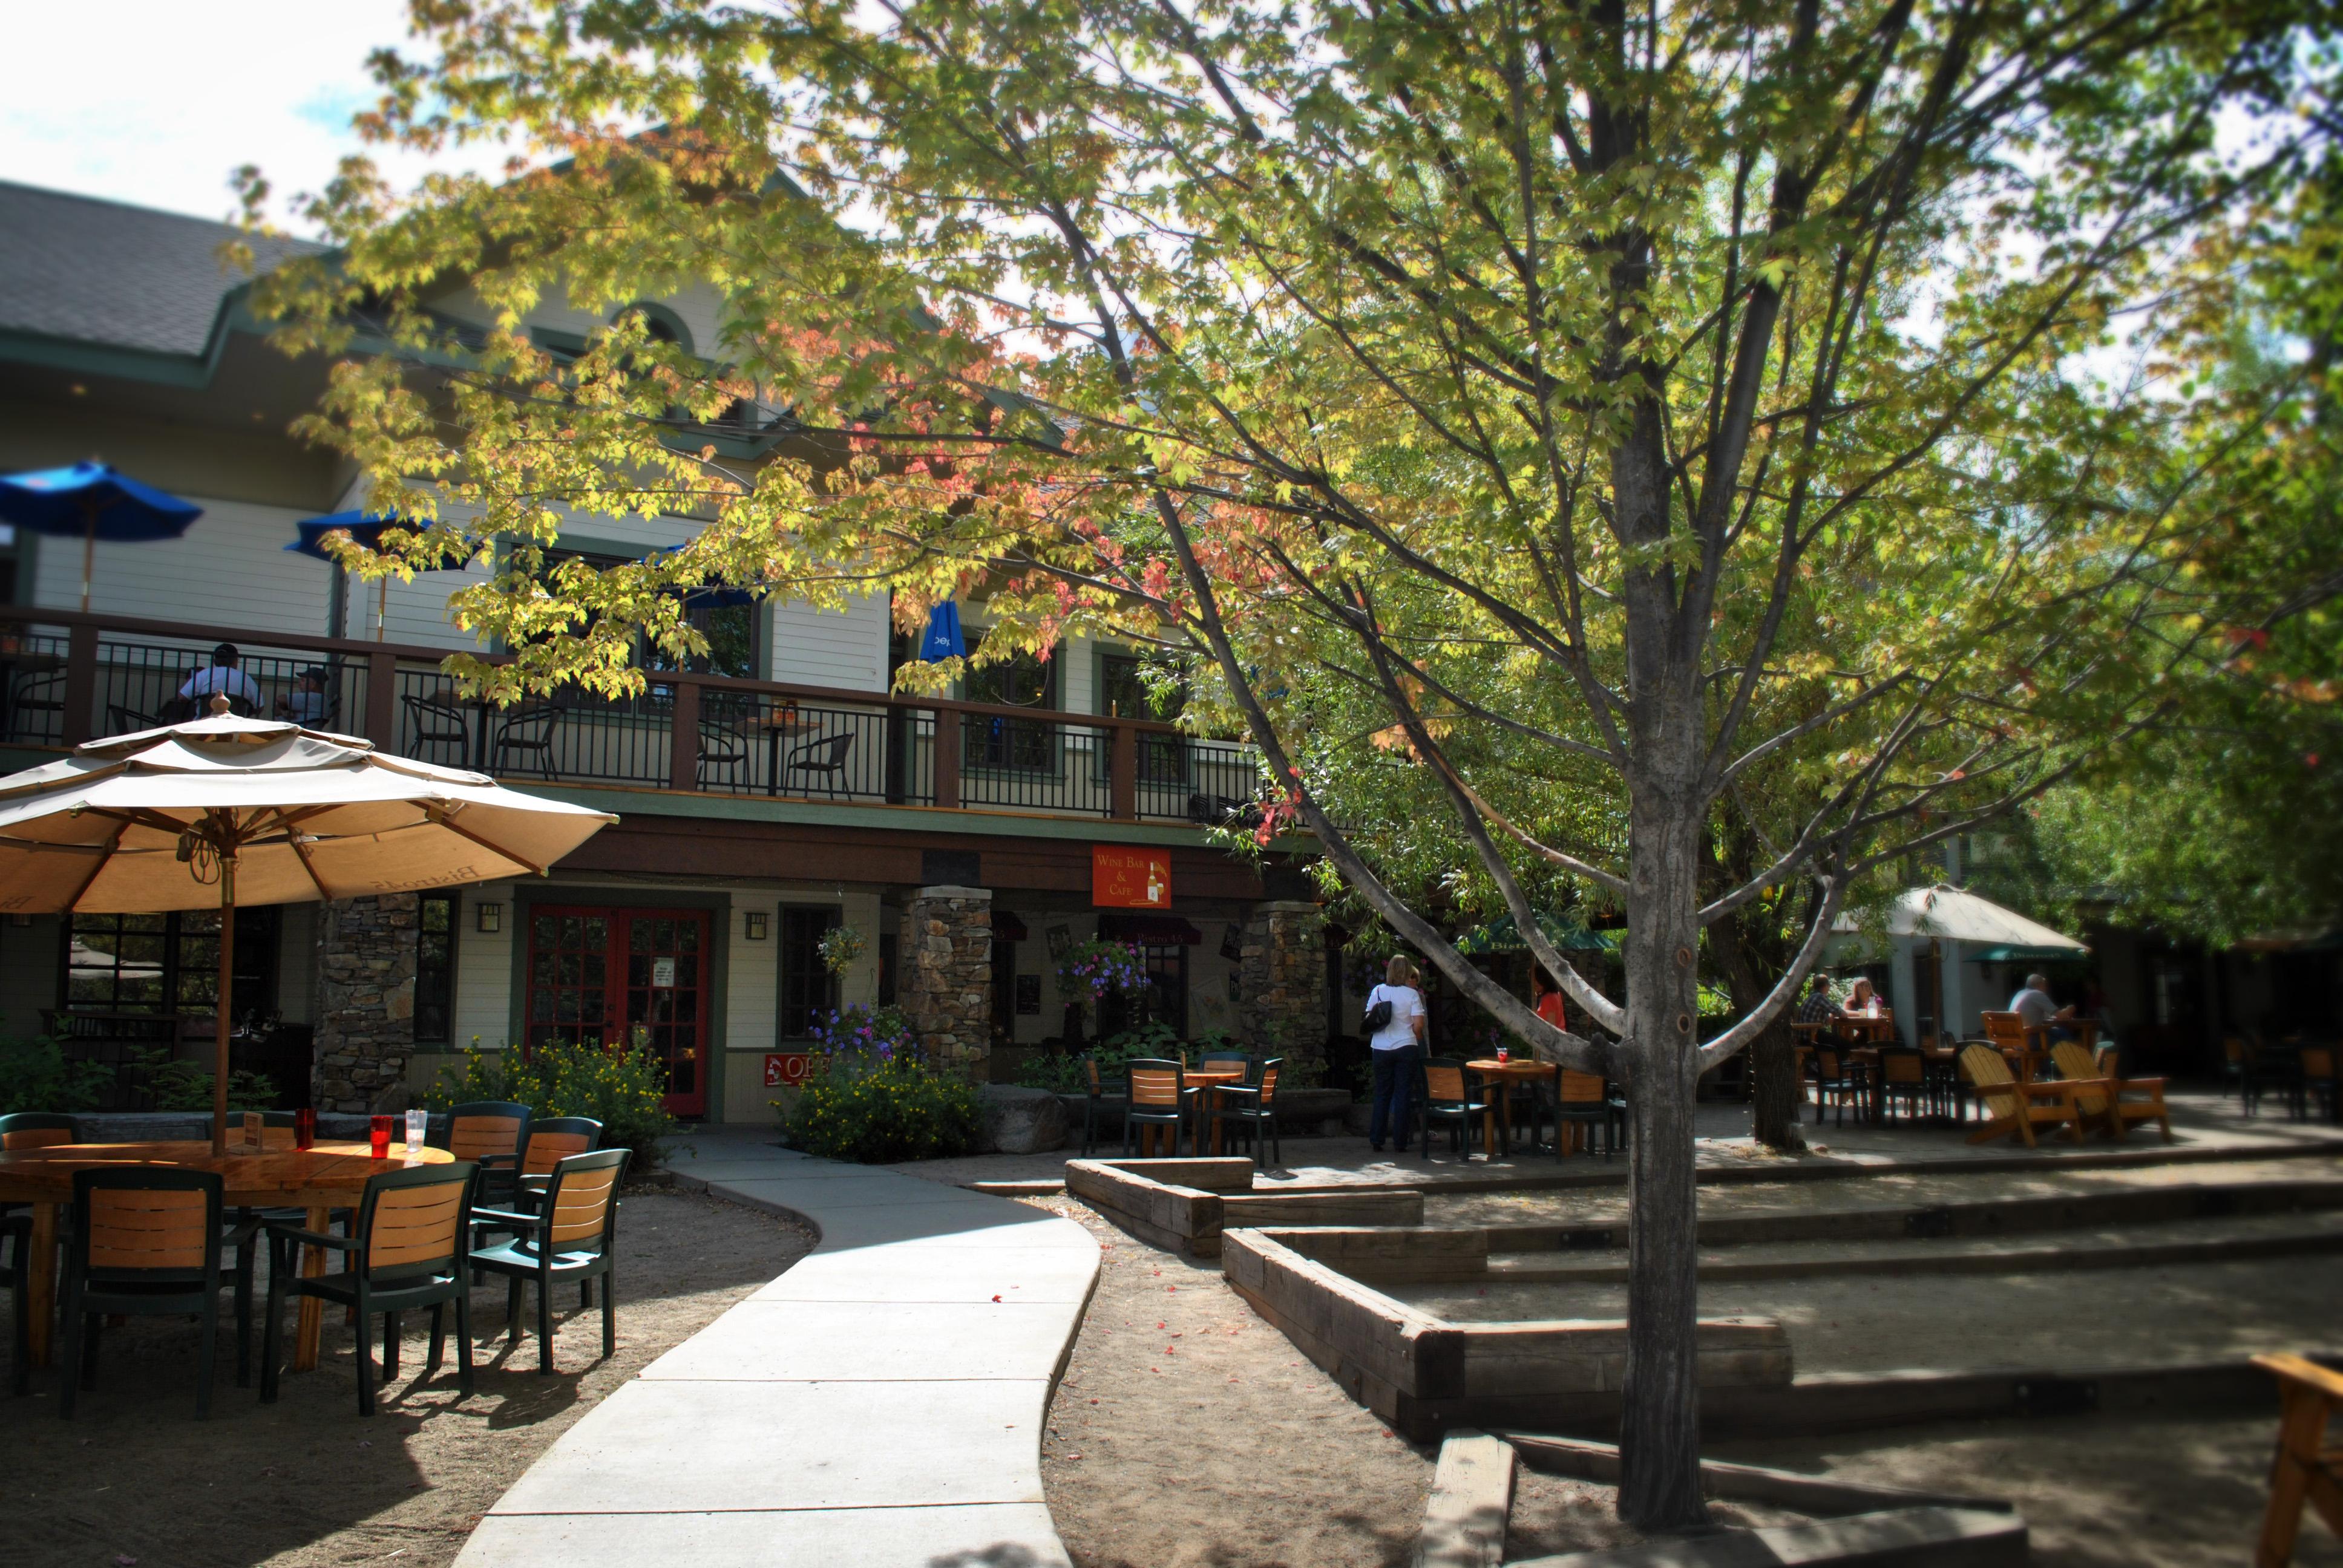 HM Courtyard (5)